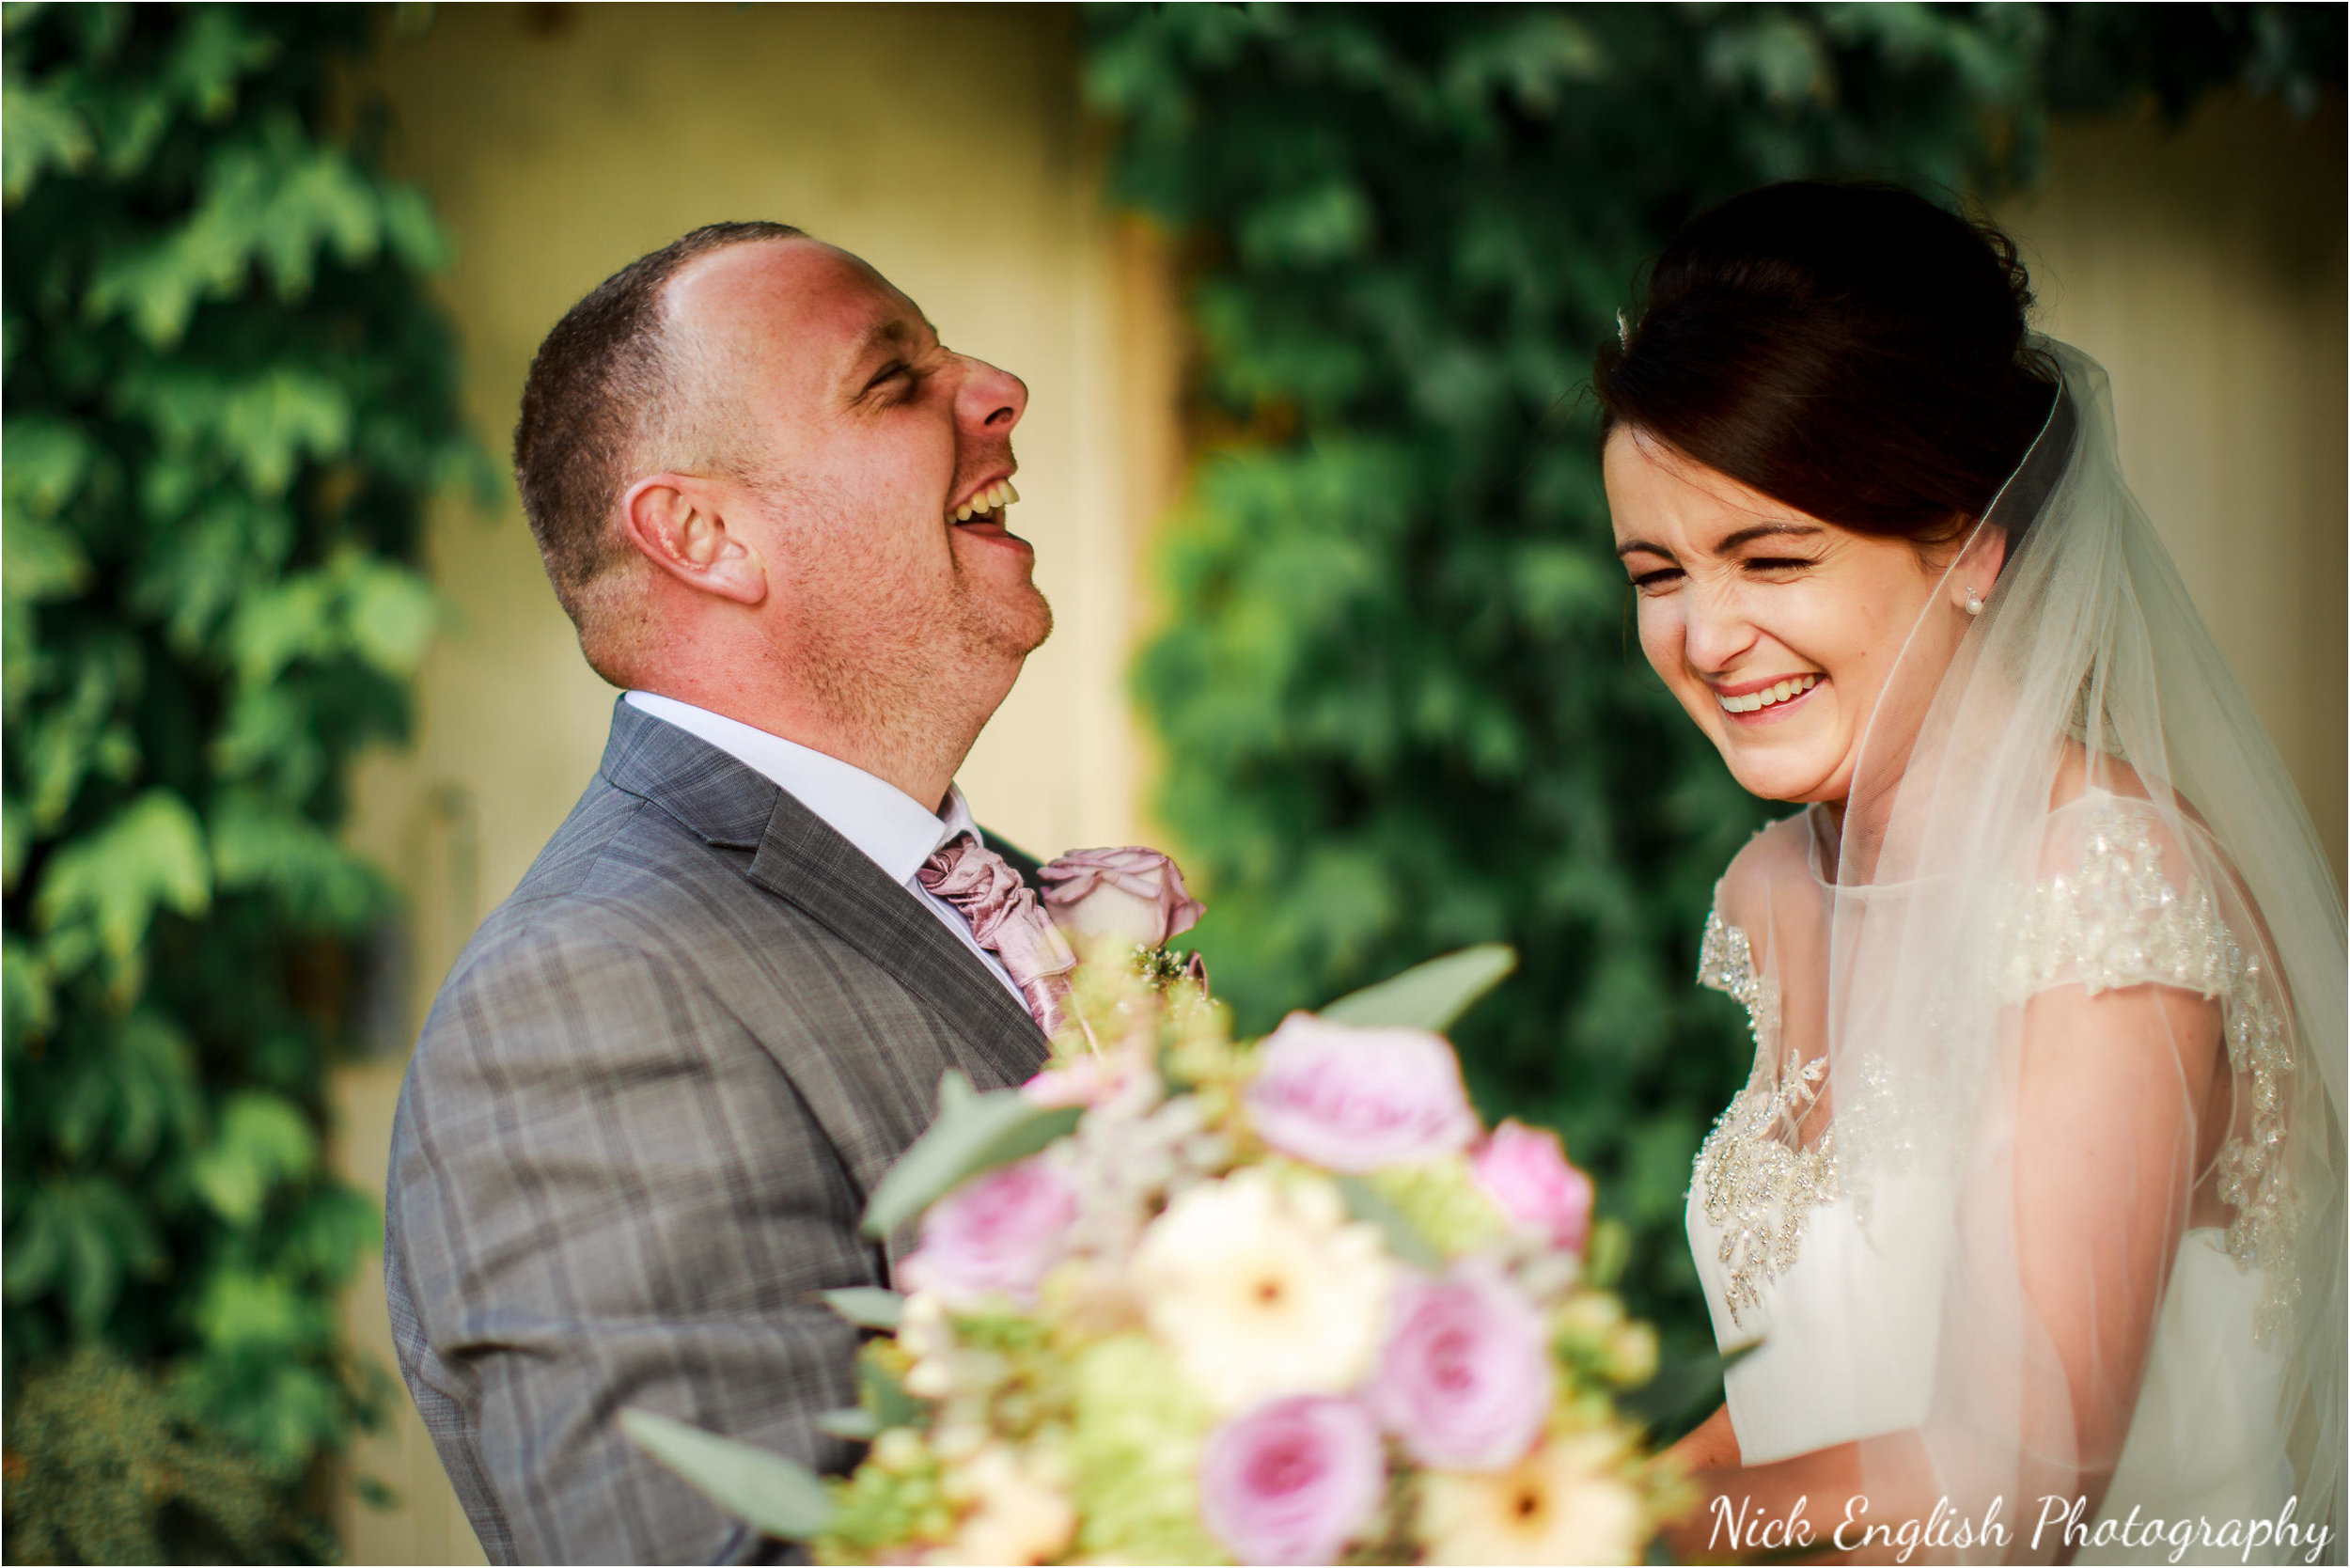 Stacey-Ash-Wedding-Photographs-Stanley-House-Preston-Lancashire-125.jpg